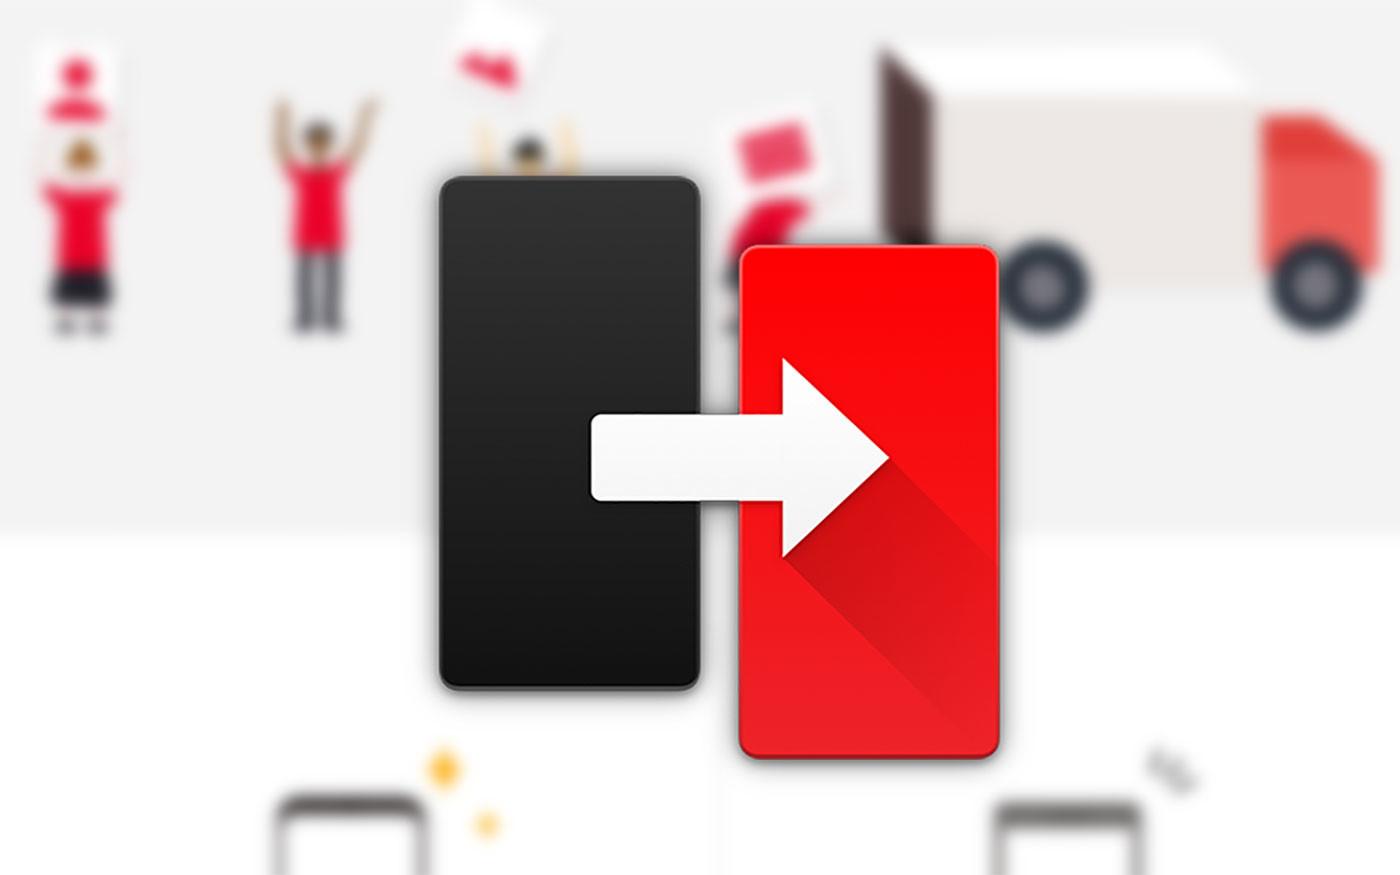 <p>Фото: &copy;&nbsp;<span>OnePlus</span></p>